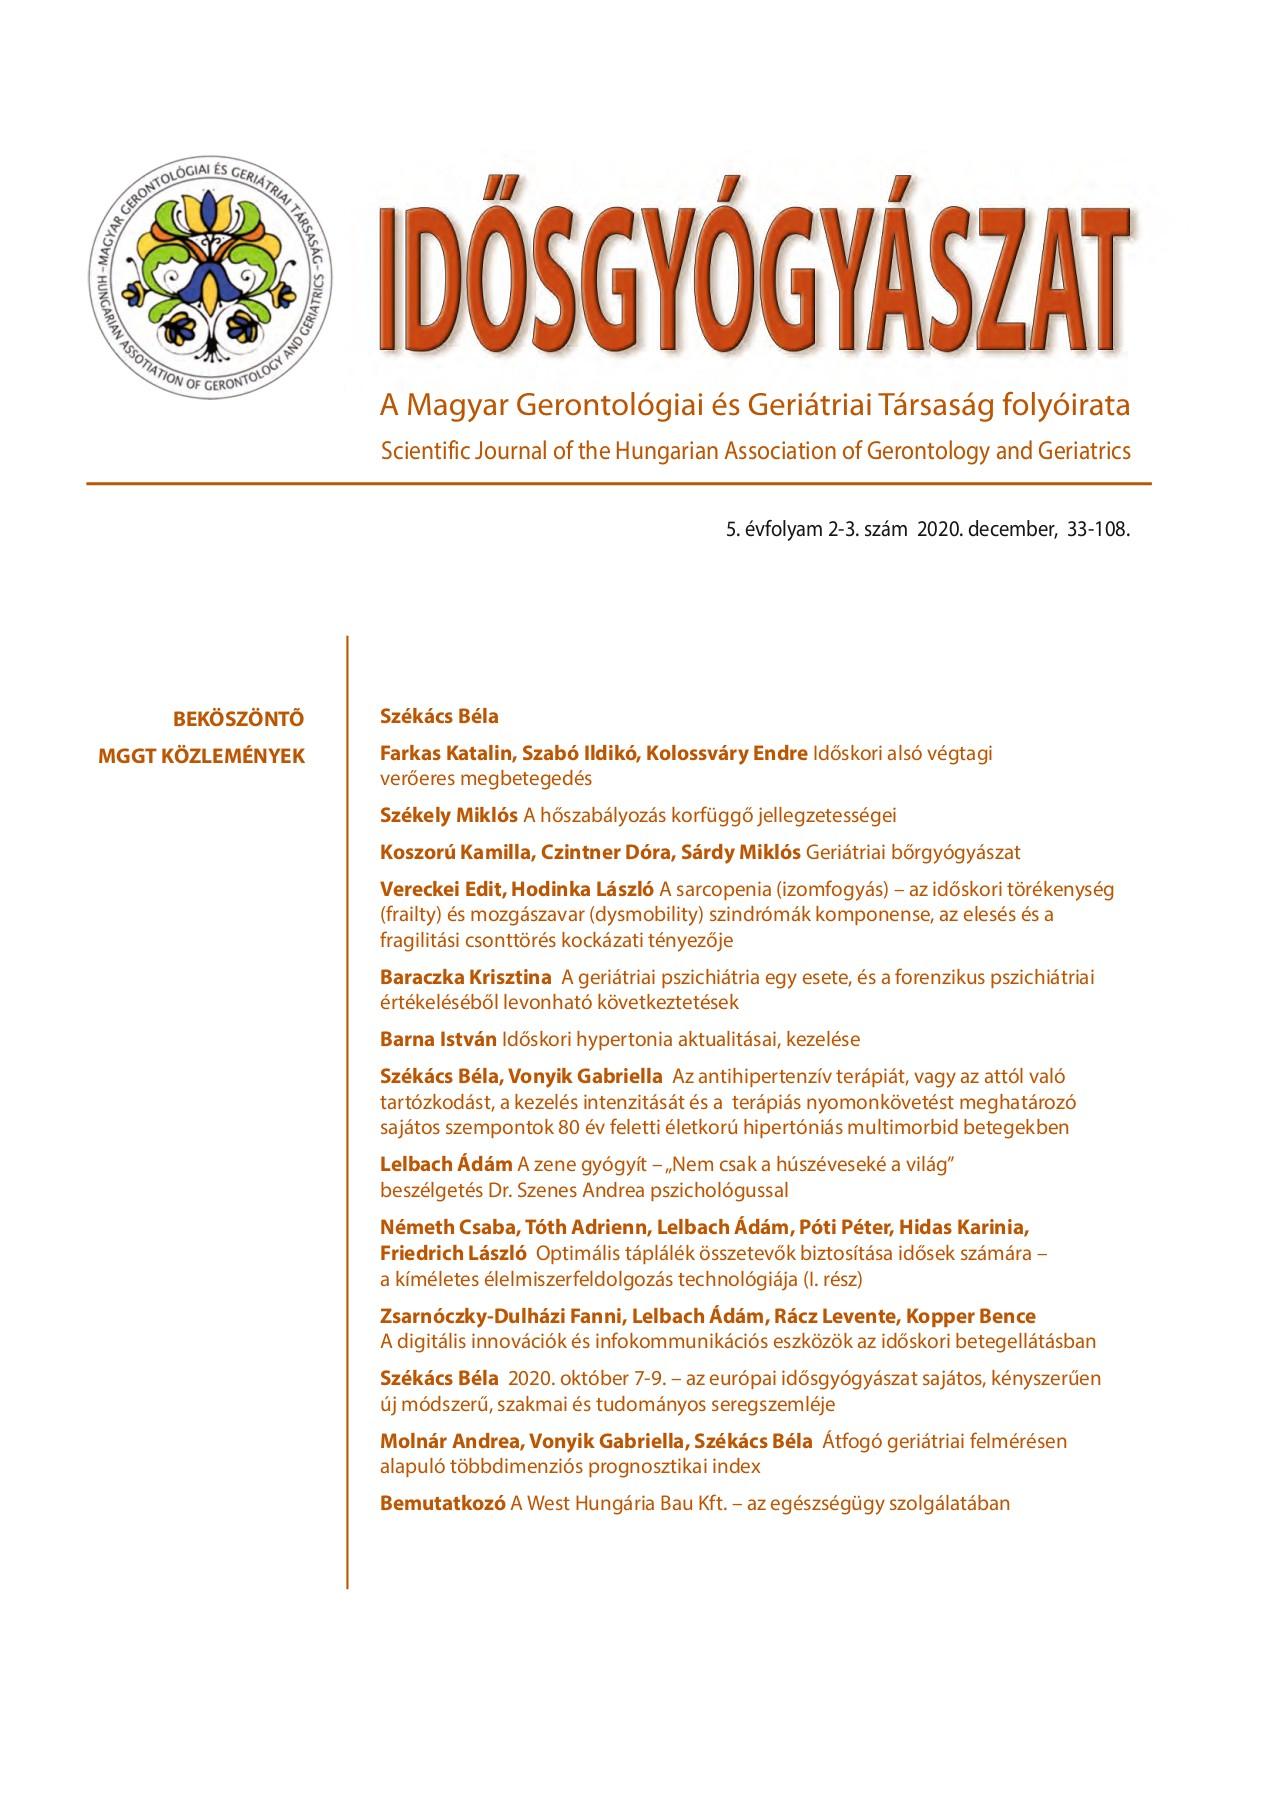 diastole definition systole